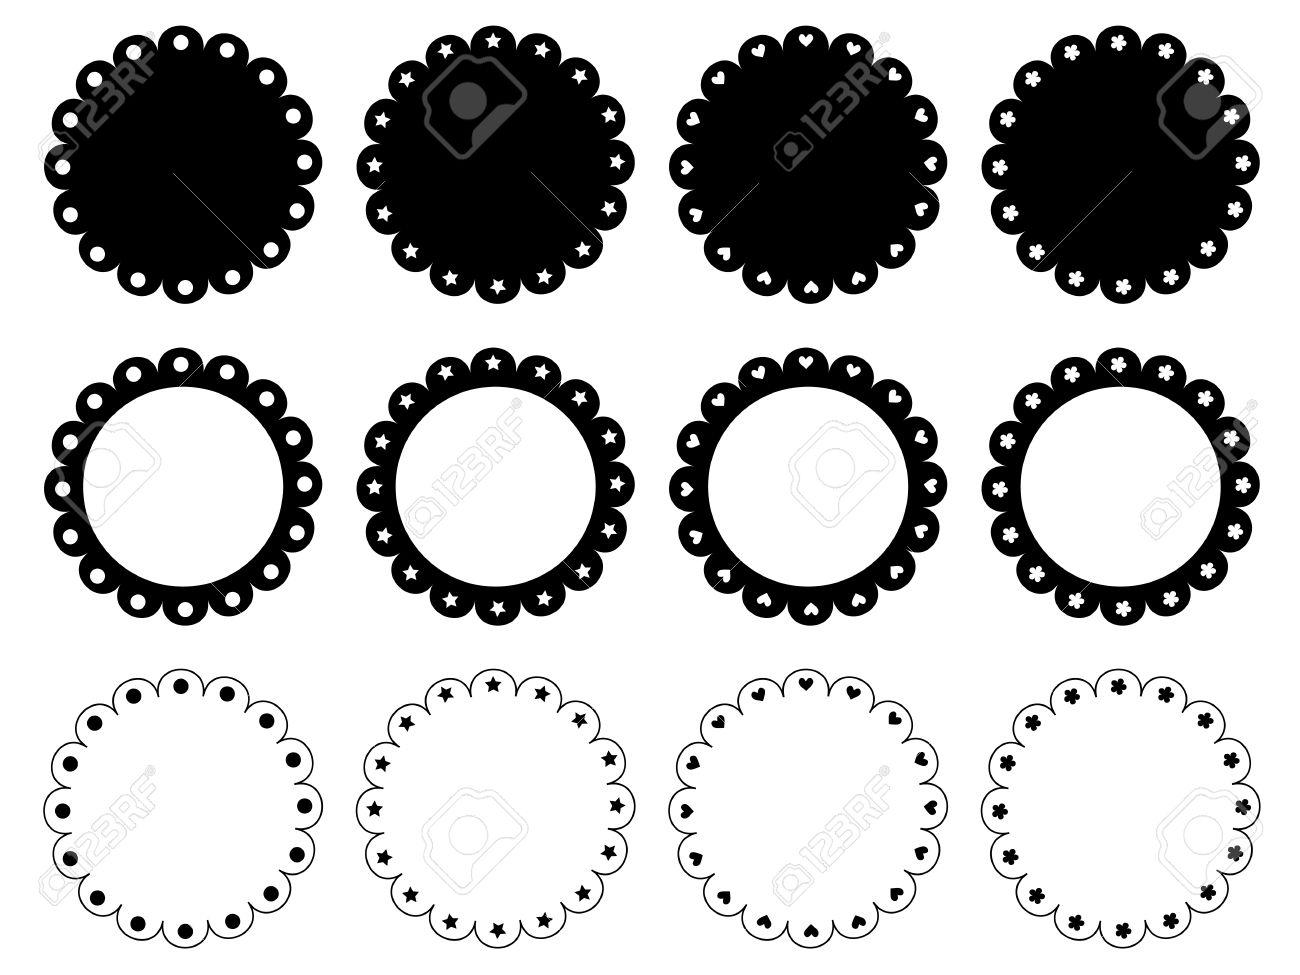 Scalloped edge circle frame set - 61790298